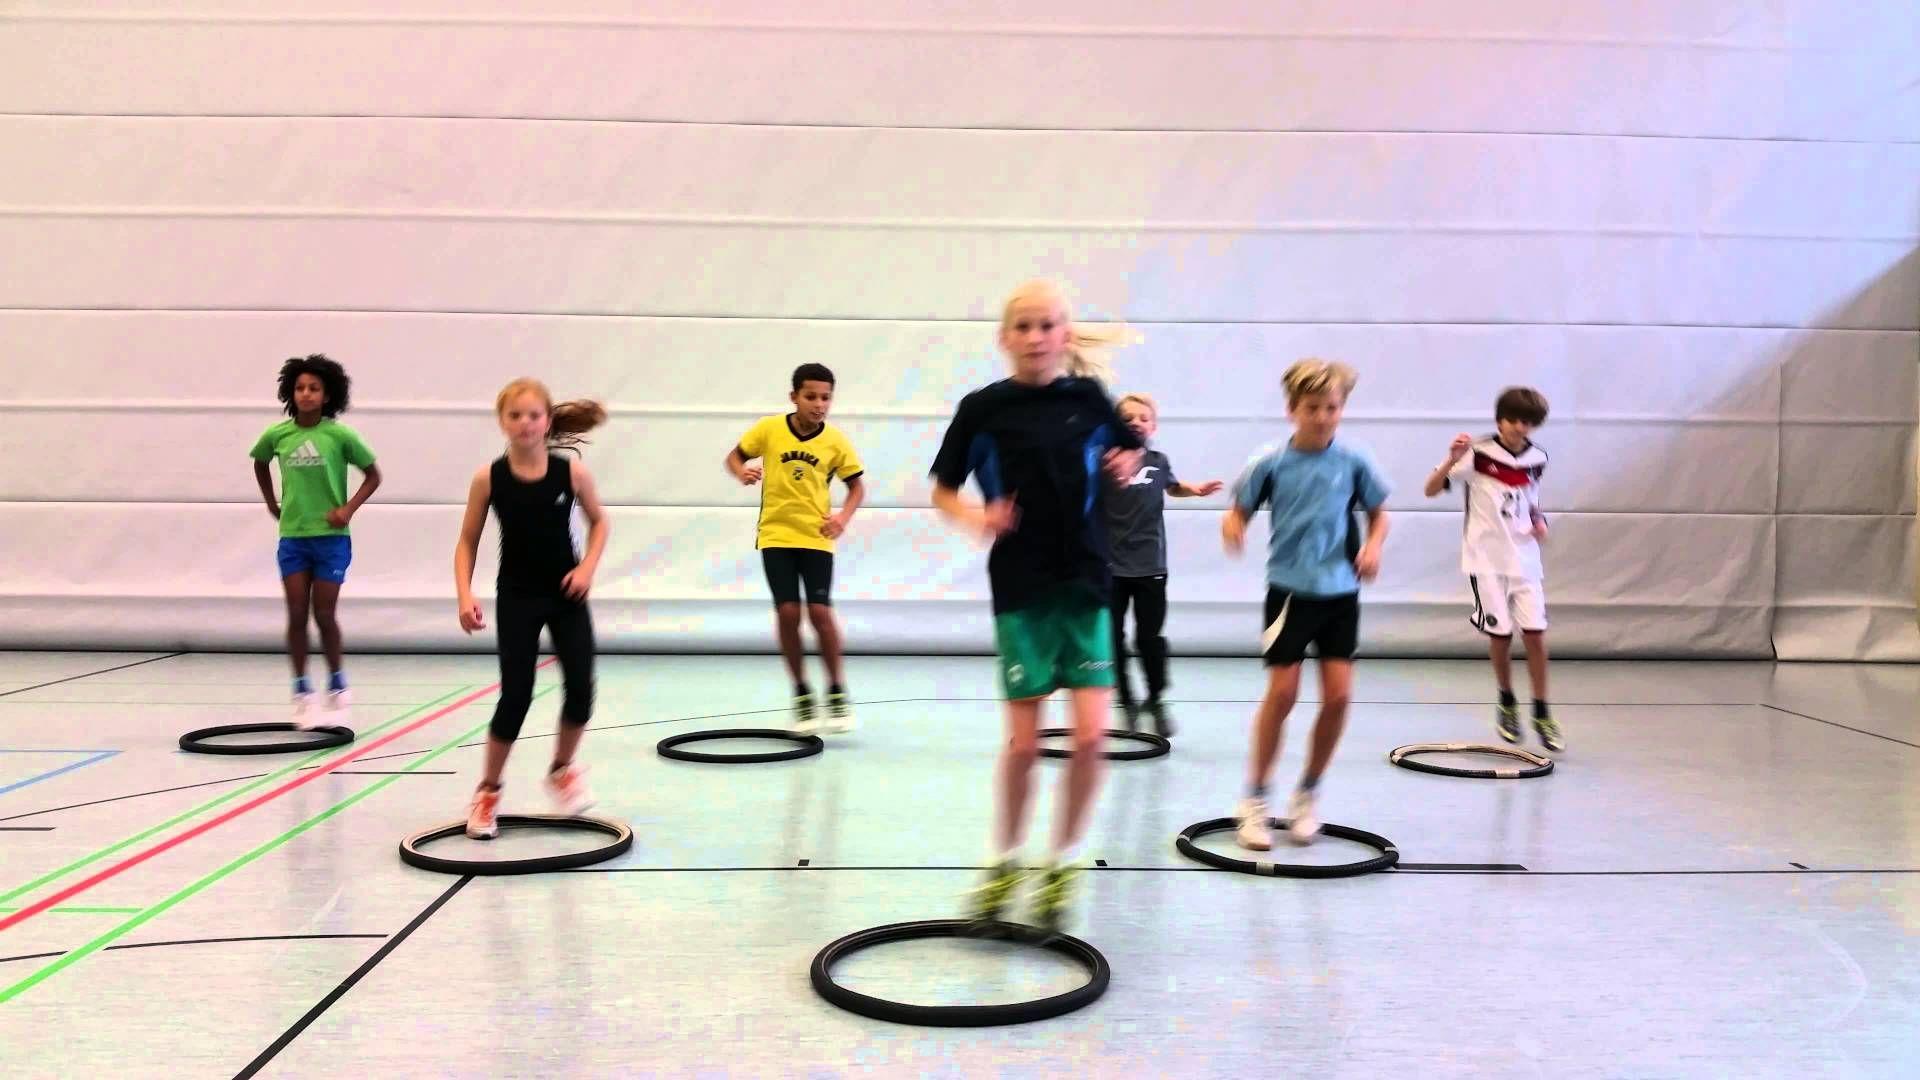 Koordinatives Sprungtraining Sportunterricht